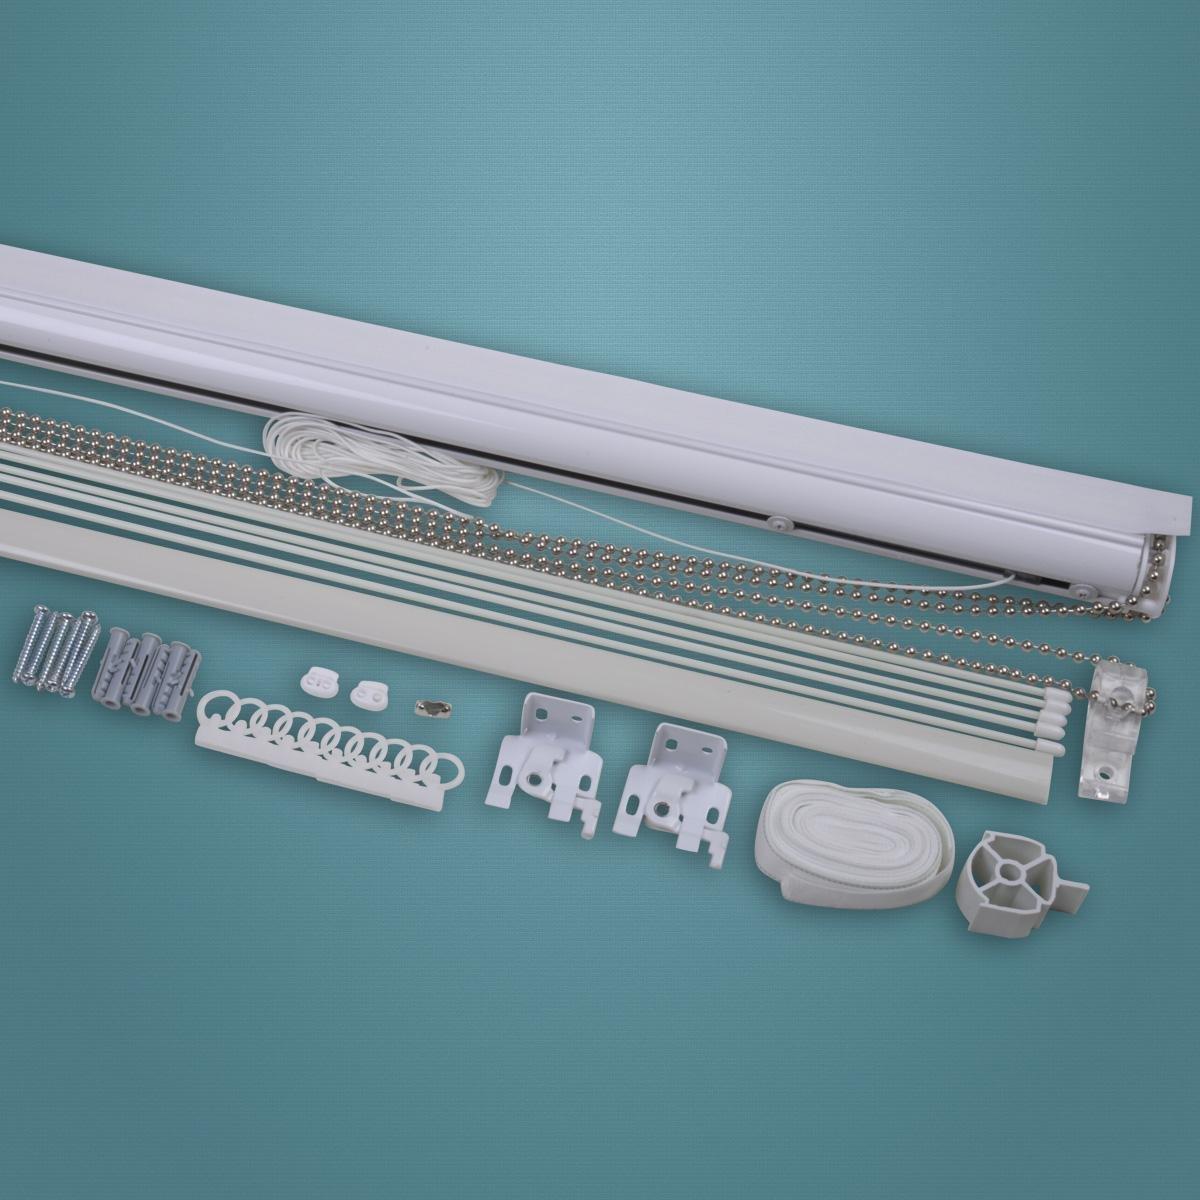 Cassette Roman Blind Kit 180cm (71) Speedy Products